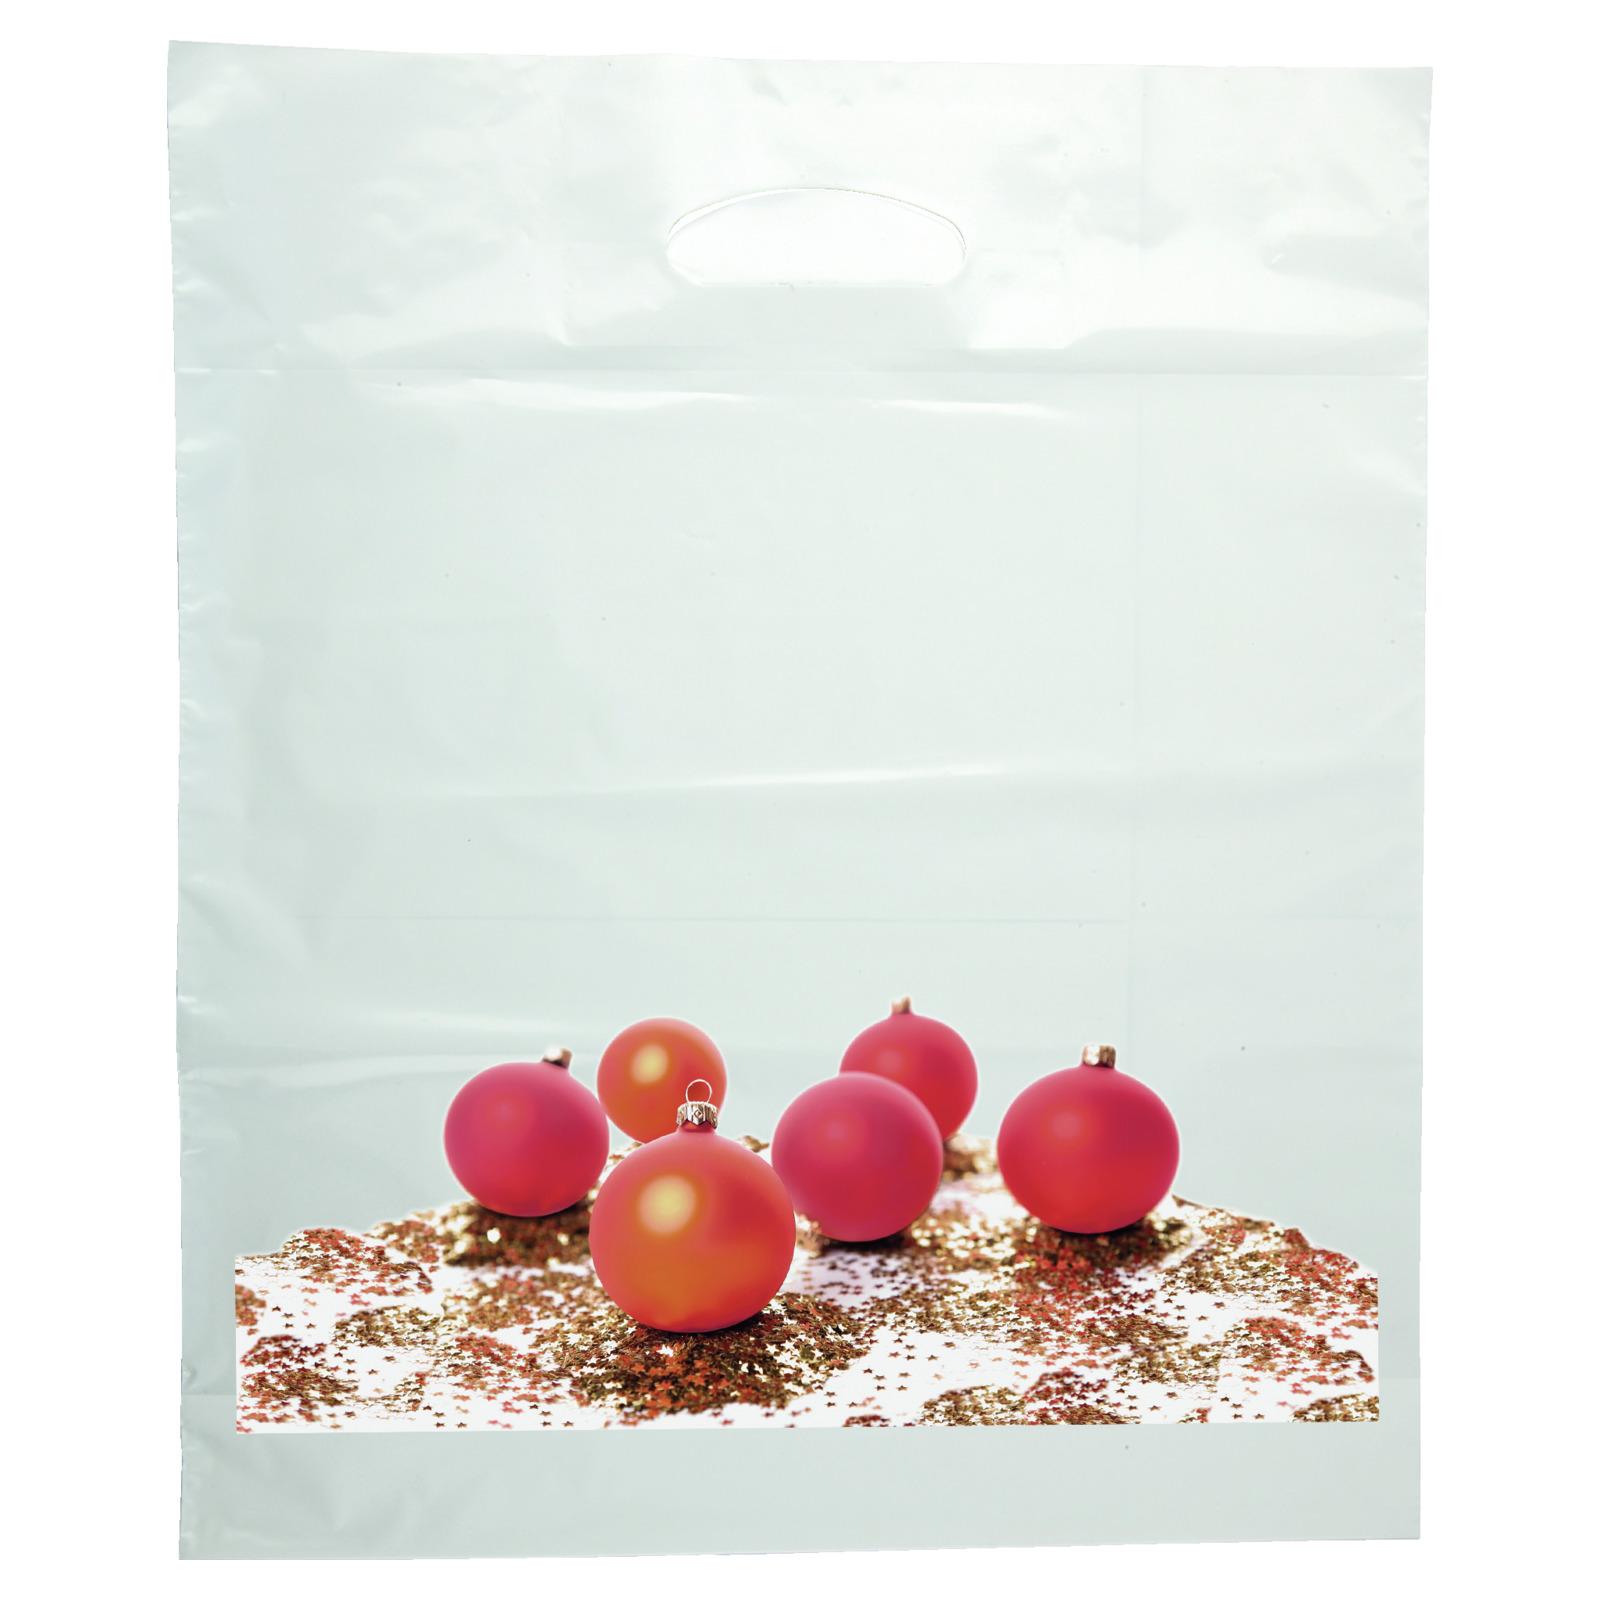 kunststoff tragetasche weihnachtskugeln tragetaschen weihnachten weihnachten specials. Black Bedroom Furniture Sets. Home Design Ideas